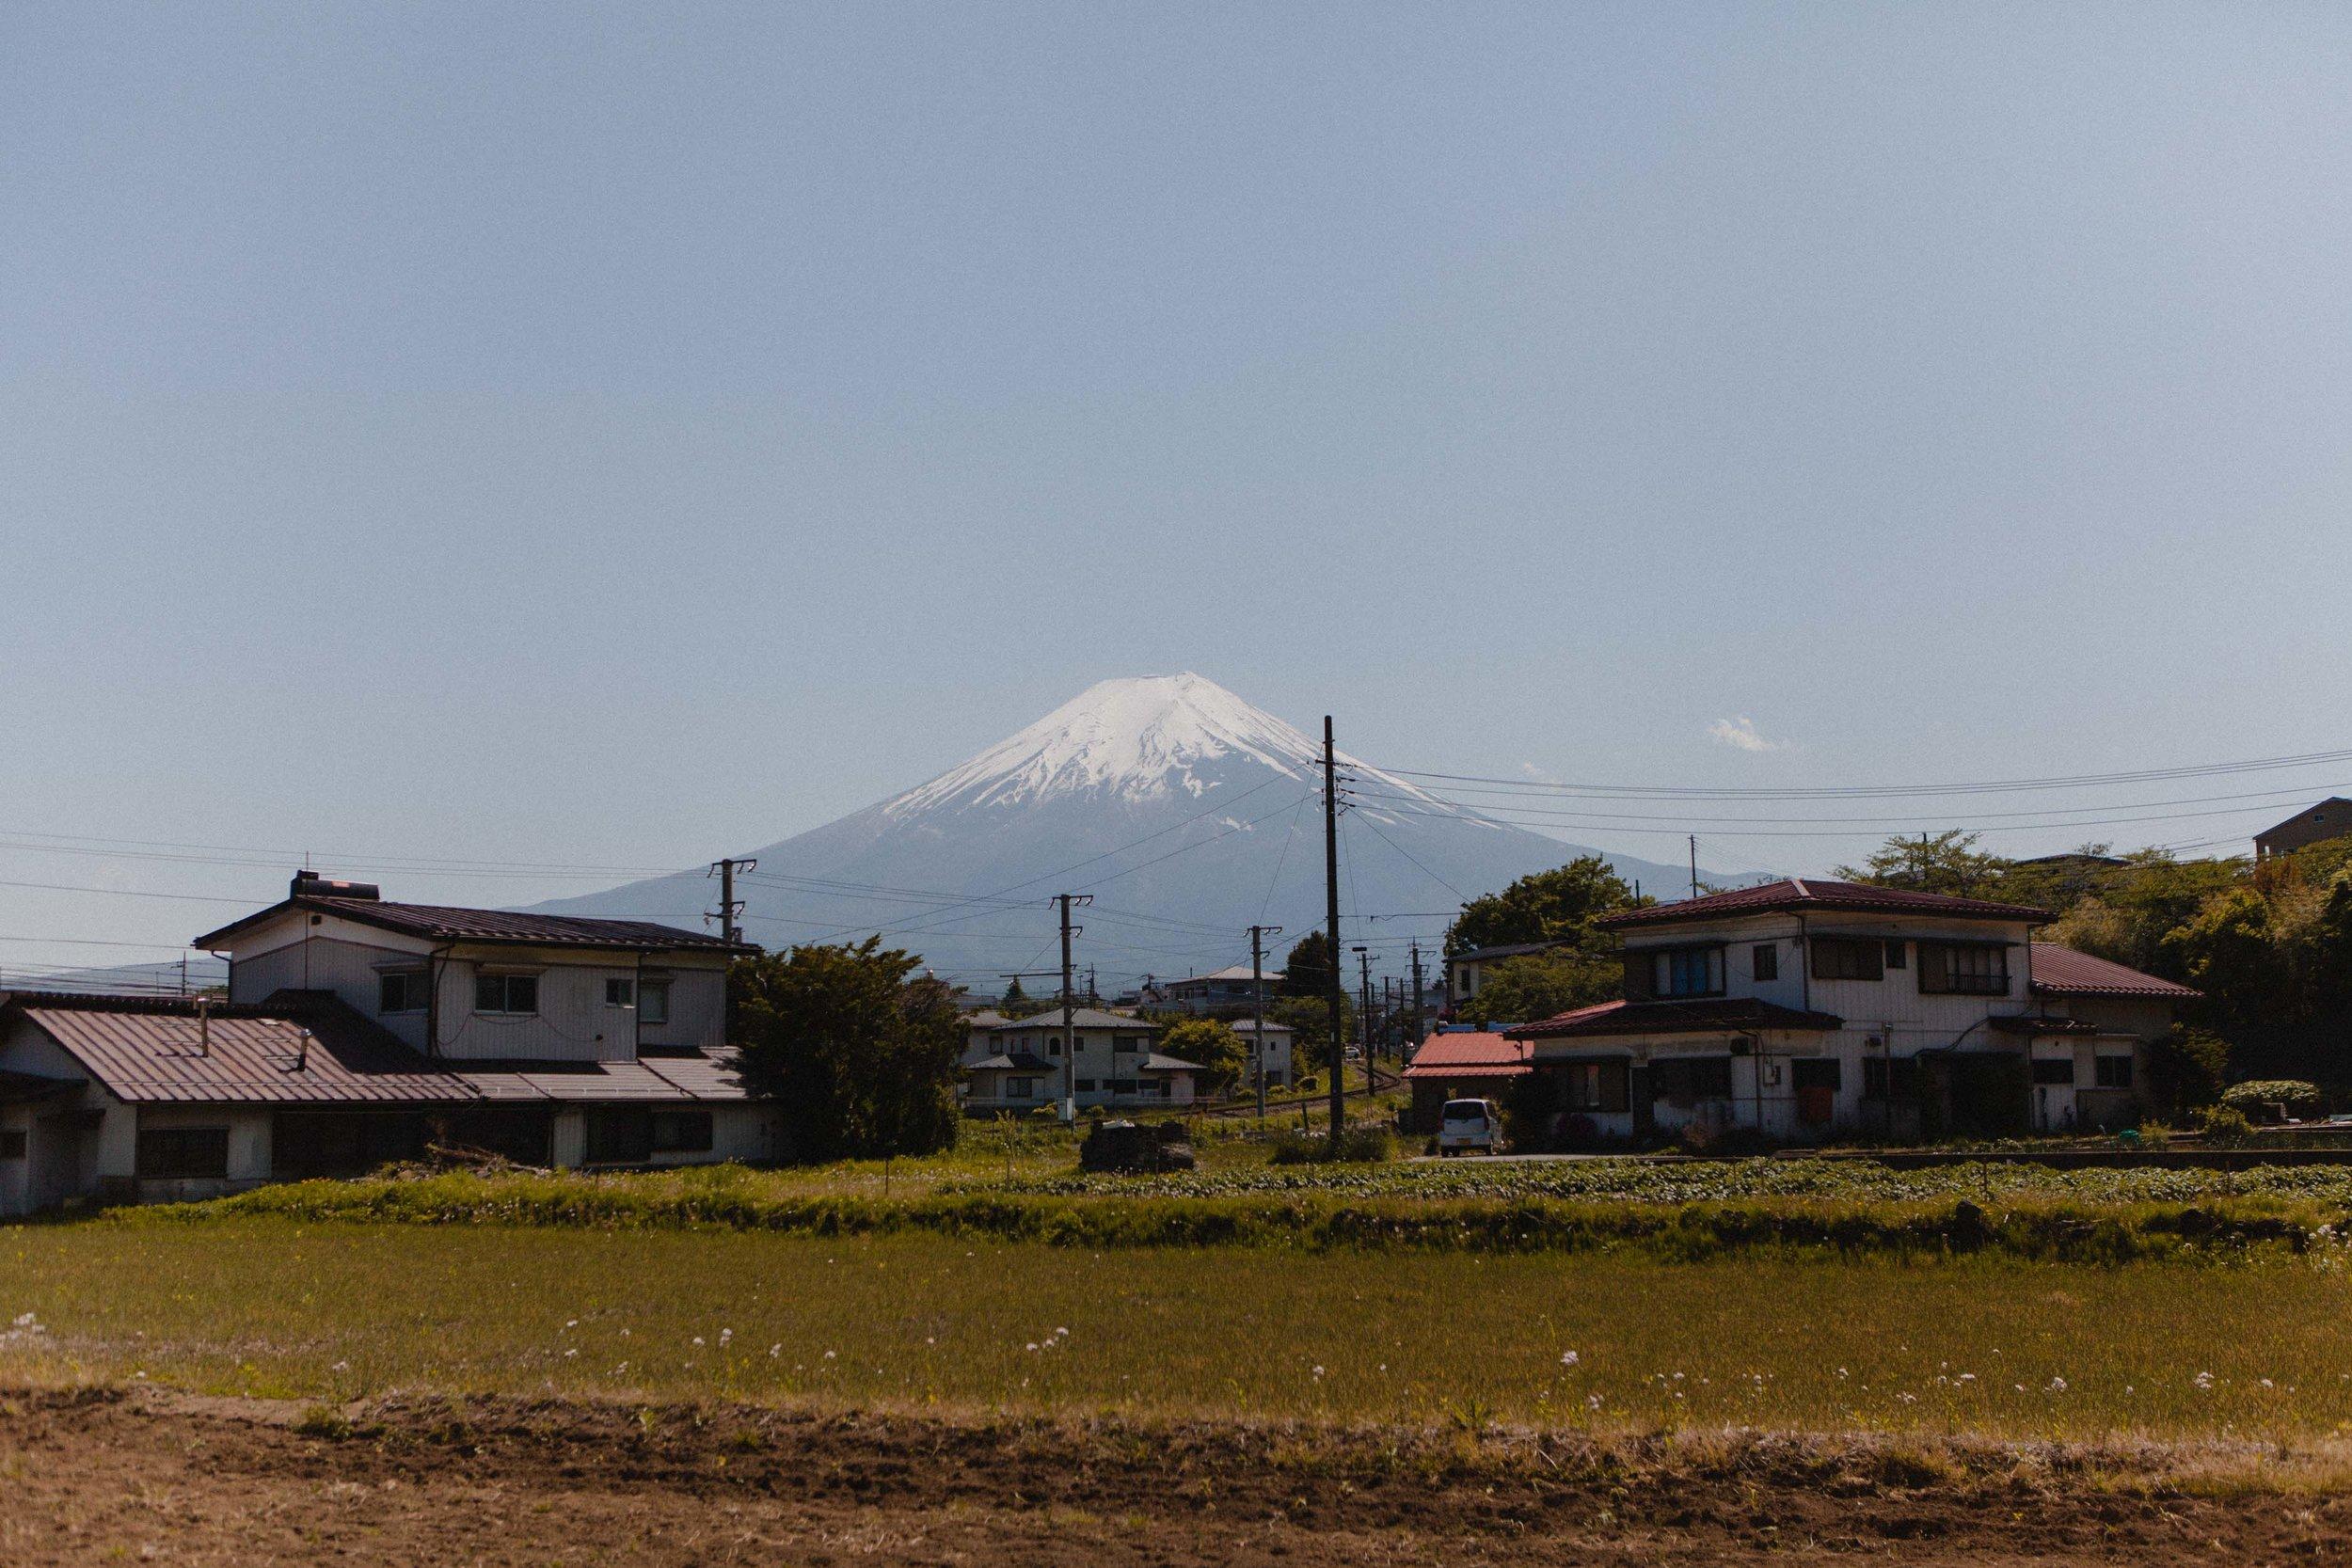 The view of Mt. Fuji walking to Shimoyoshida Station